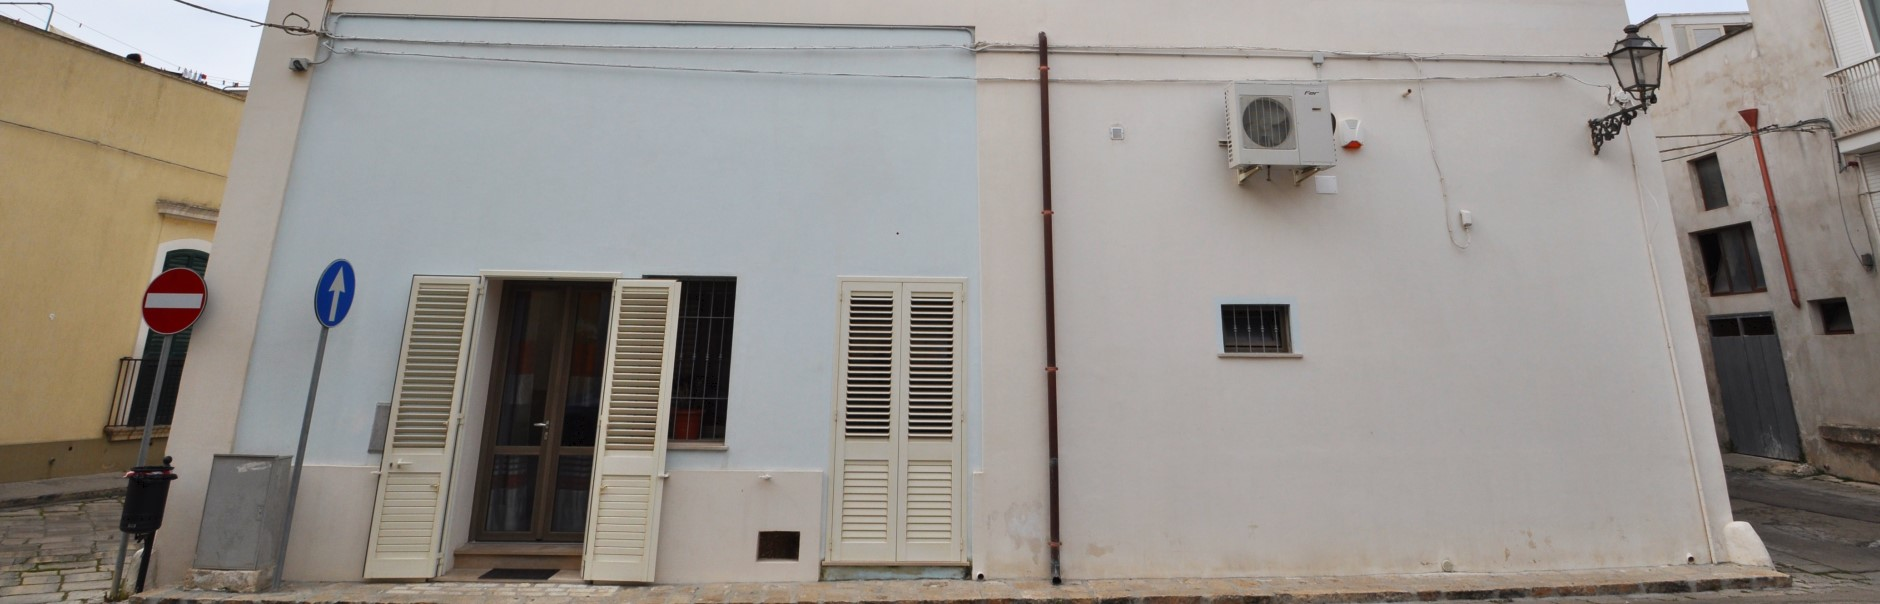 Appartamento Casa Tu Tore - Racale